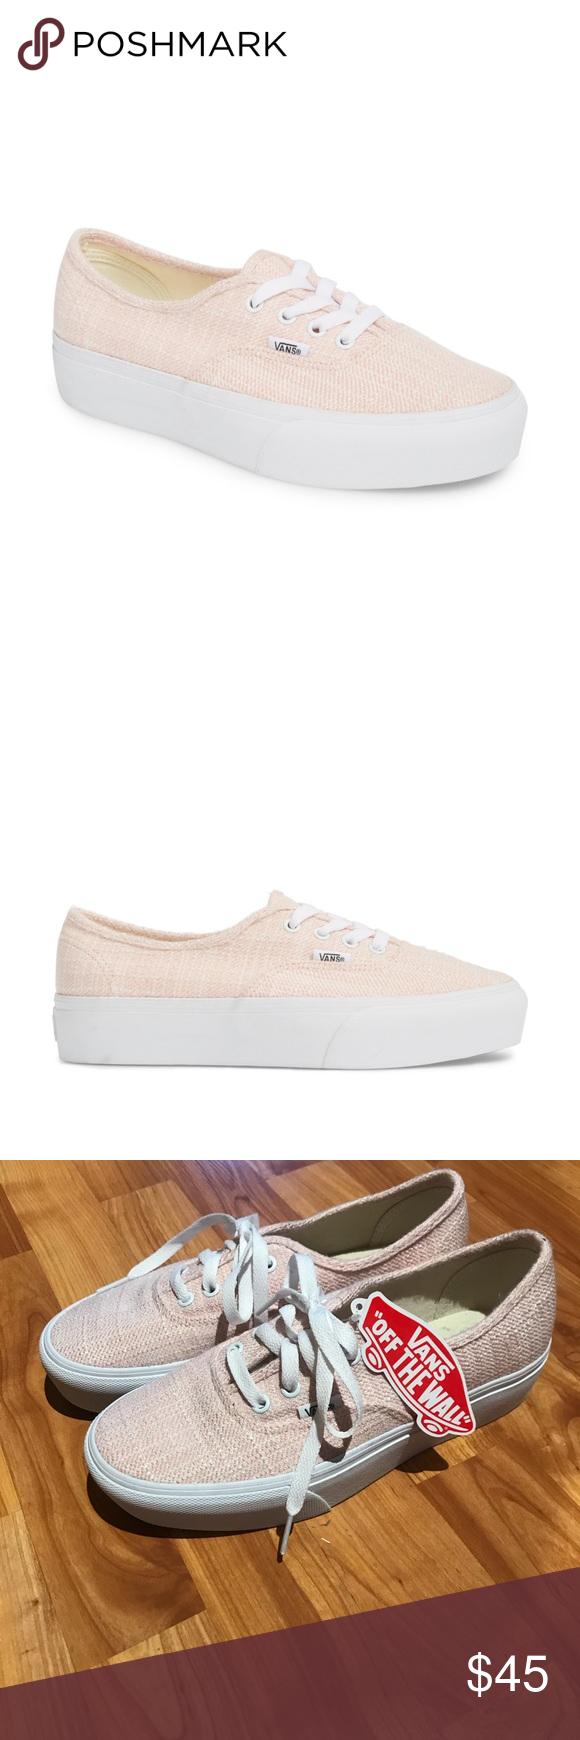 7a513e6b8da7d5 BRAND NEW Vans Authentic 2.0 Platform Size 8 Bella Rosa True White platform  sneaker. Never been worn Vans Shoes Sneakers